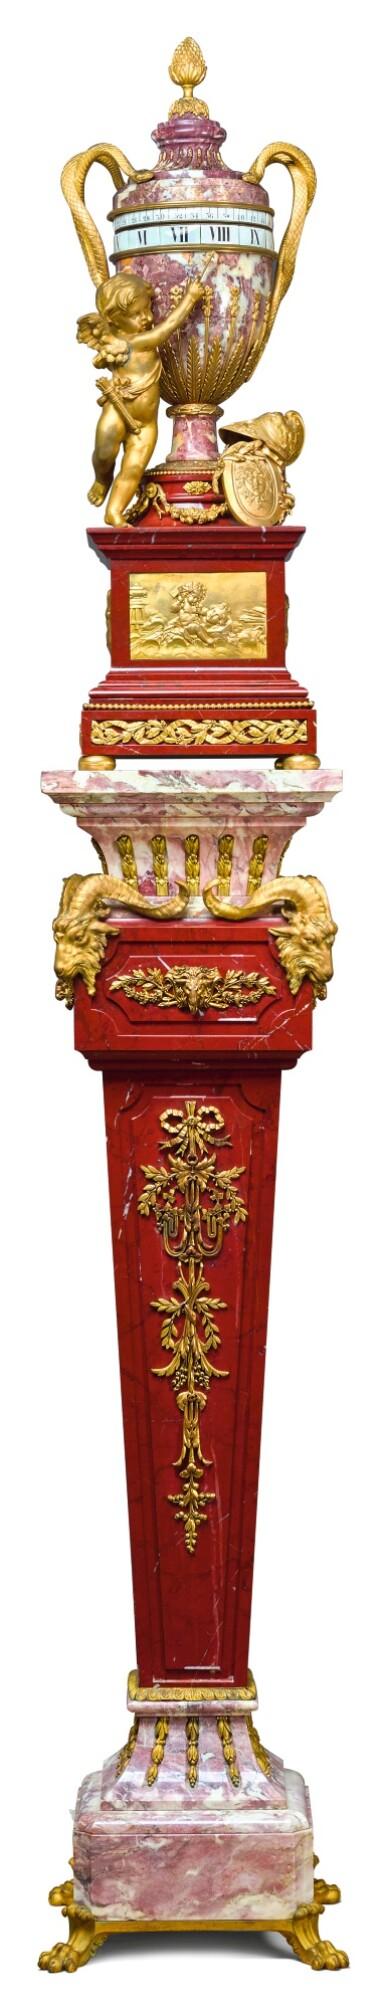 A LOUIS XVI-STYLE GILT-BRONZE MOUNTED MARBLE 'CERCLES TOURNANTS' PEDESTAL CLOCK , CIRCA 1900